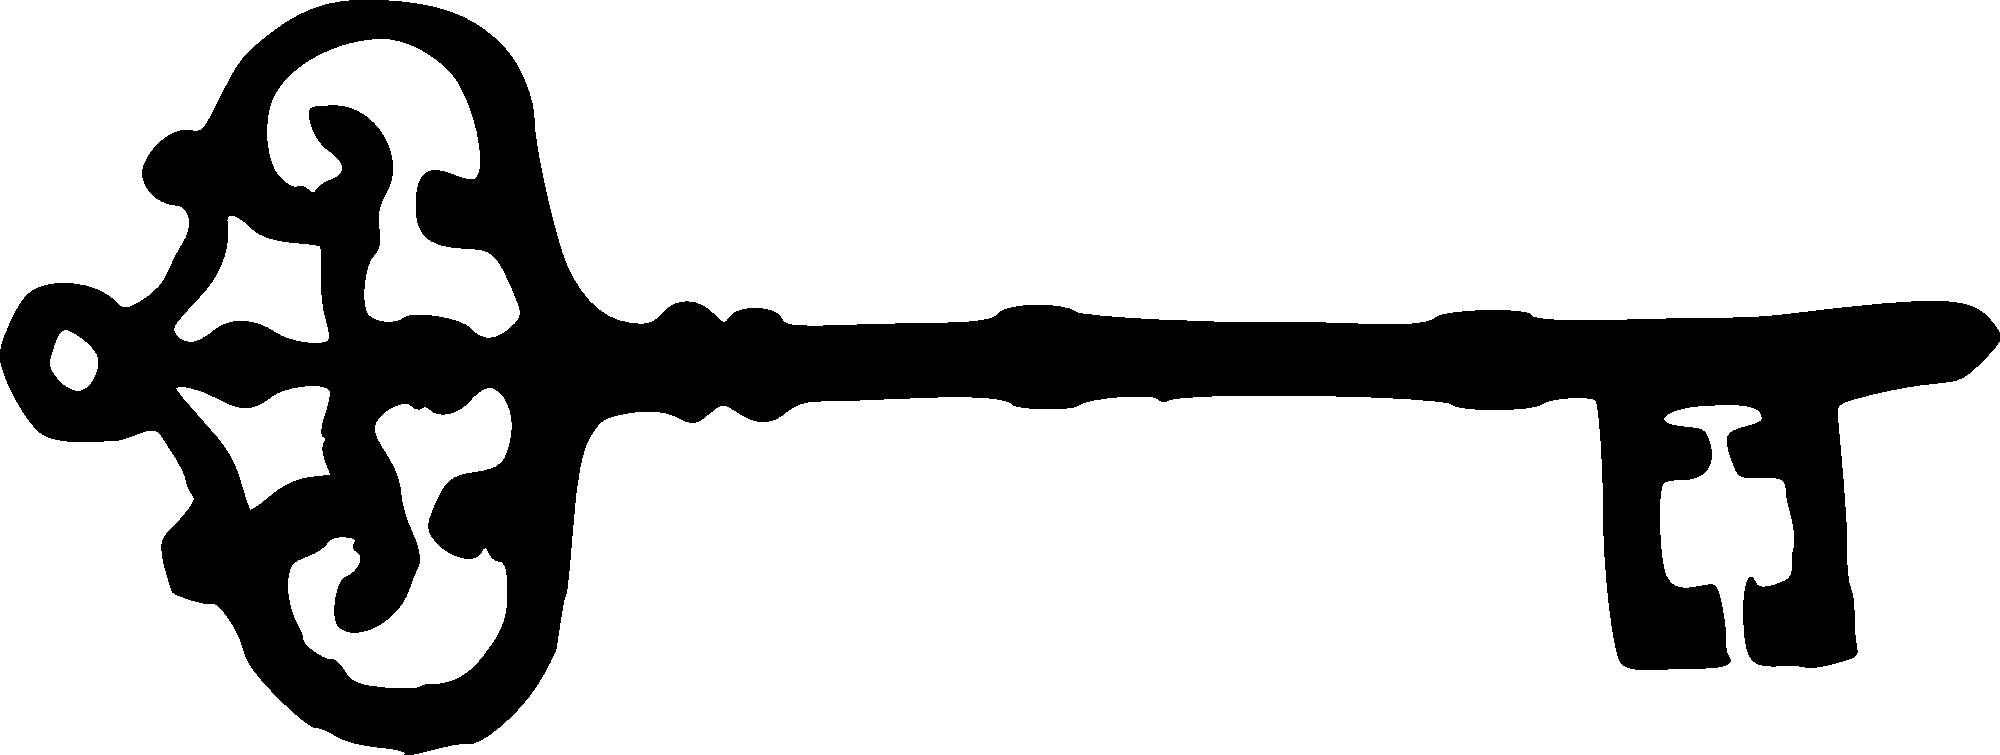 8 Skeleton Key Silhouettes (PNG Transparent)   OnlyGFX.com